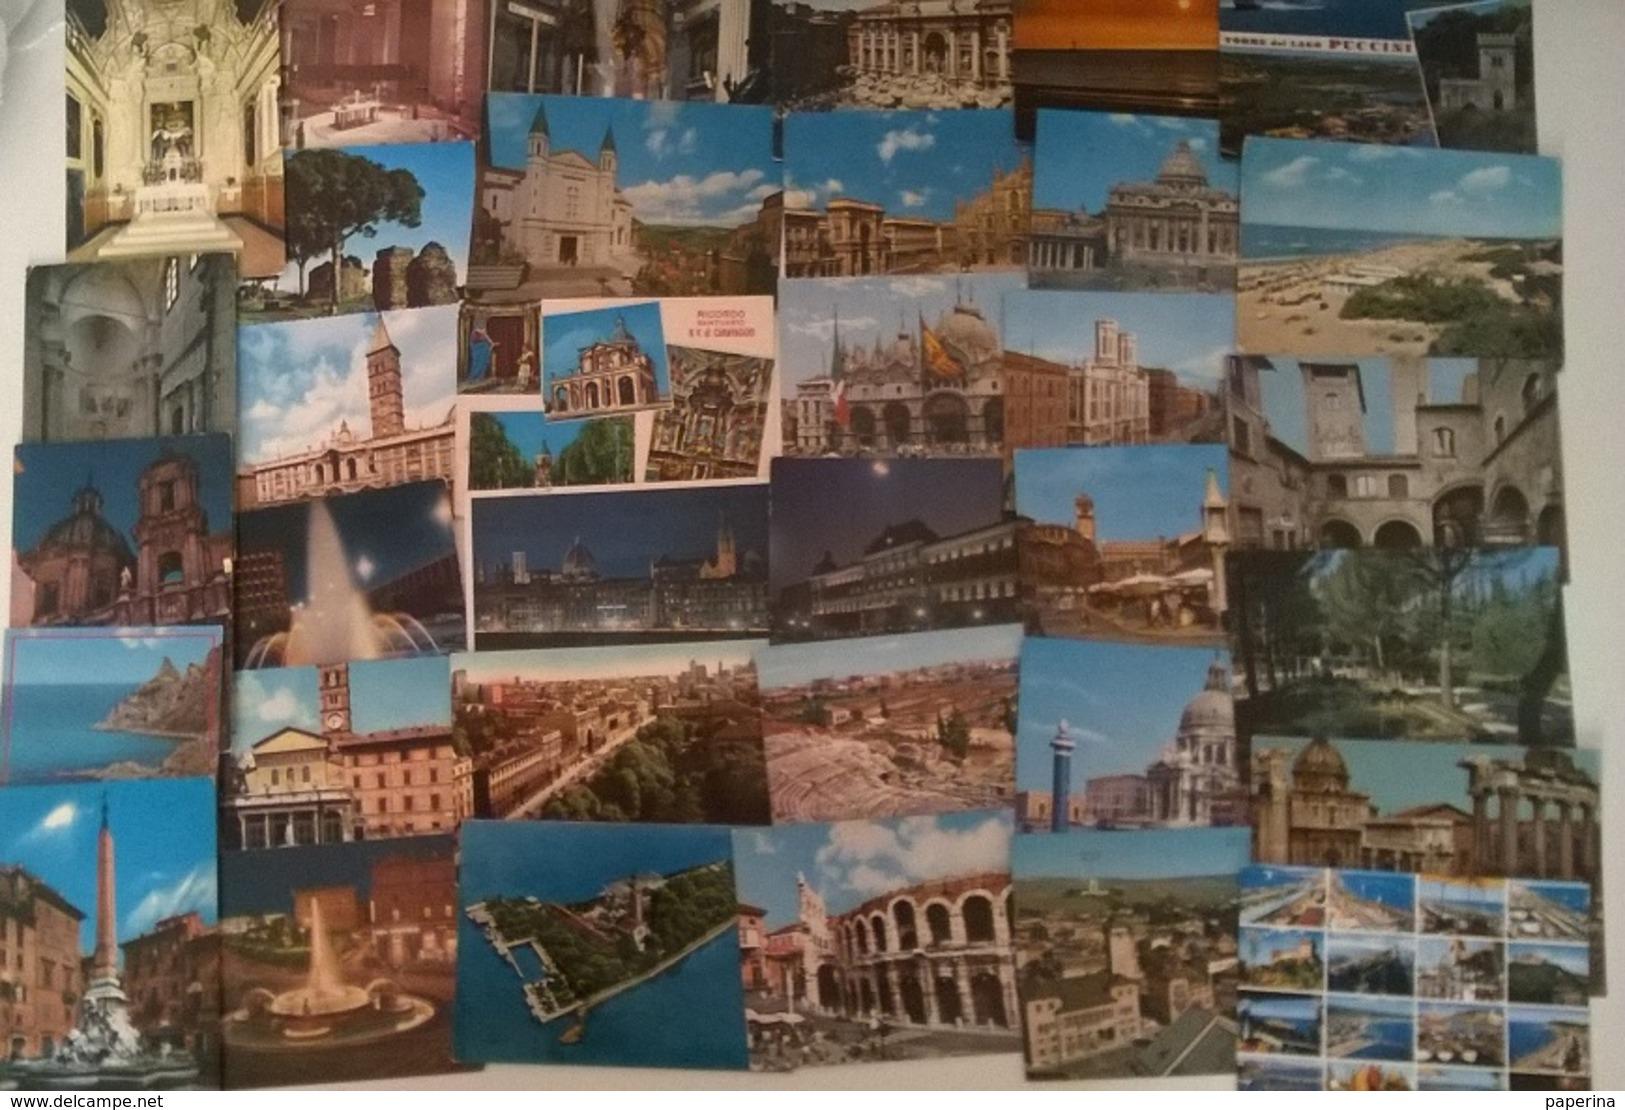 35 CARTOLINE ITALIA (3) - Cartoline